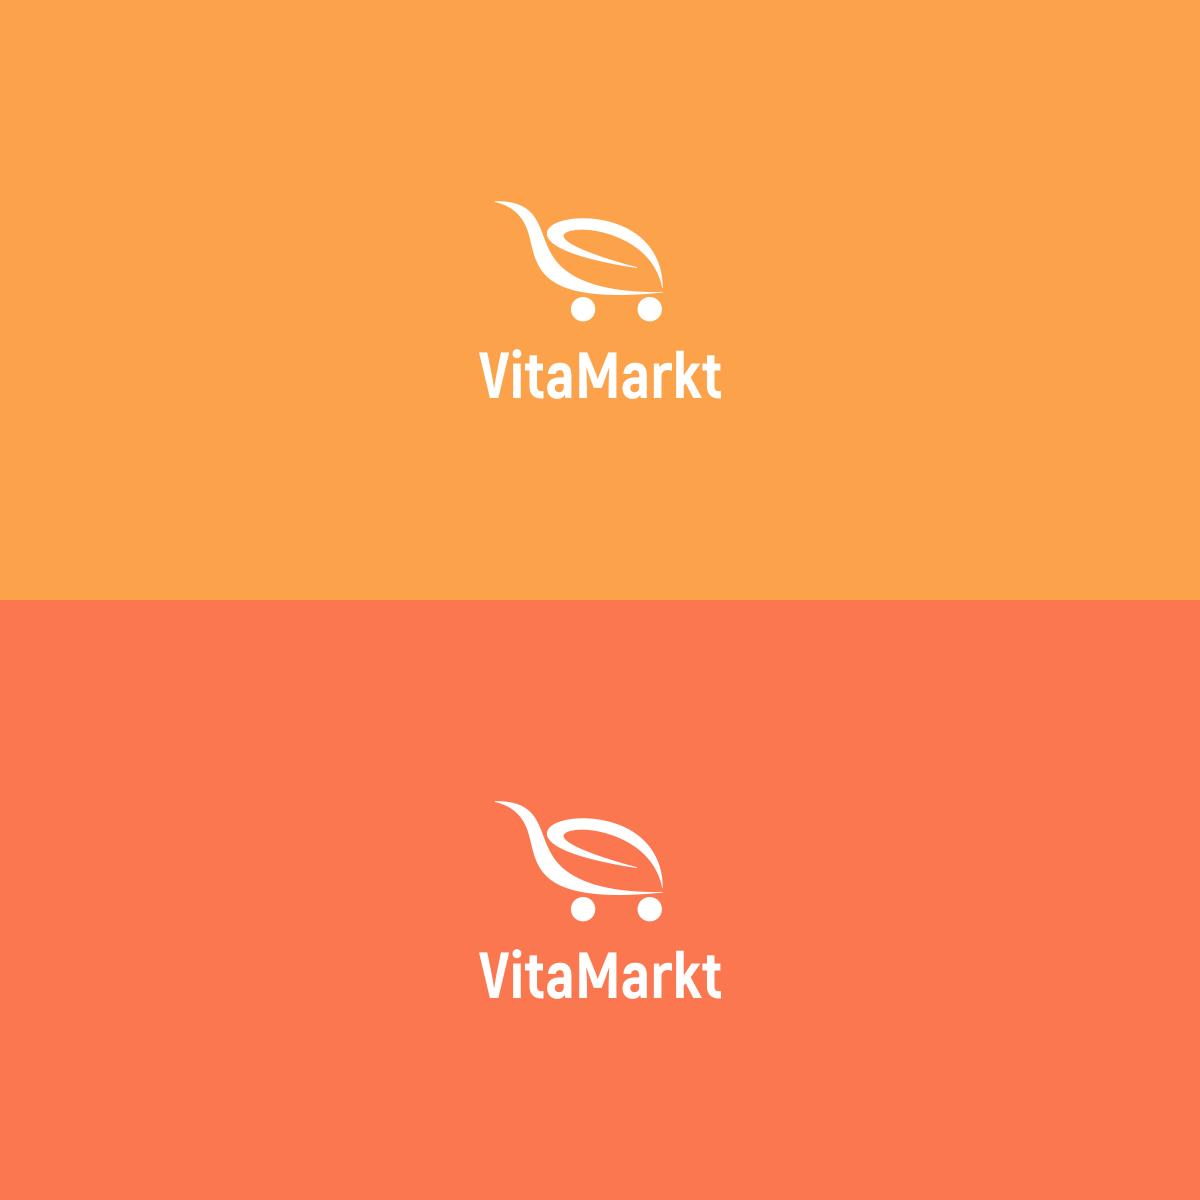 Design a creative logo for VitaMarkt